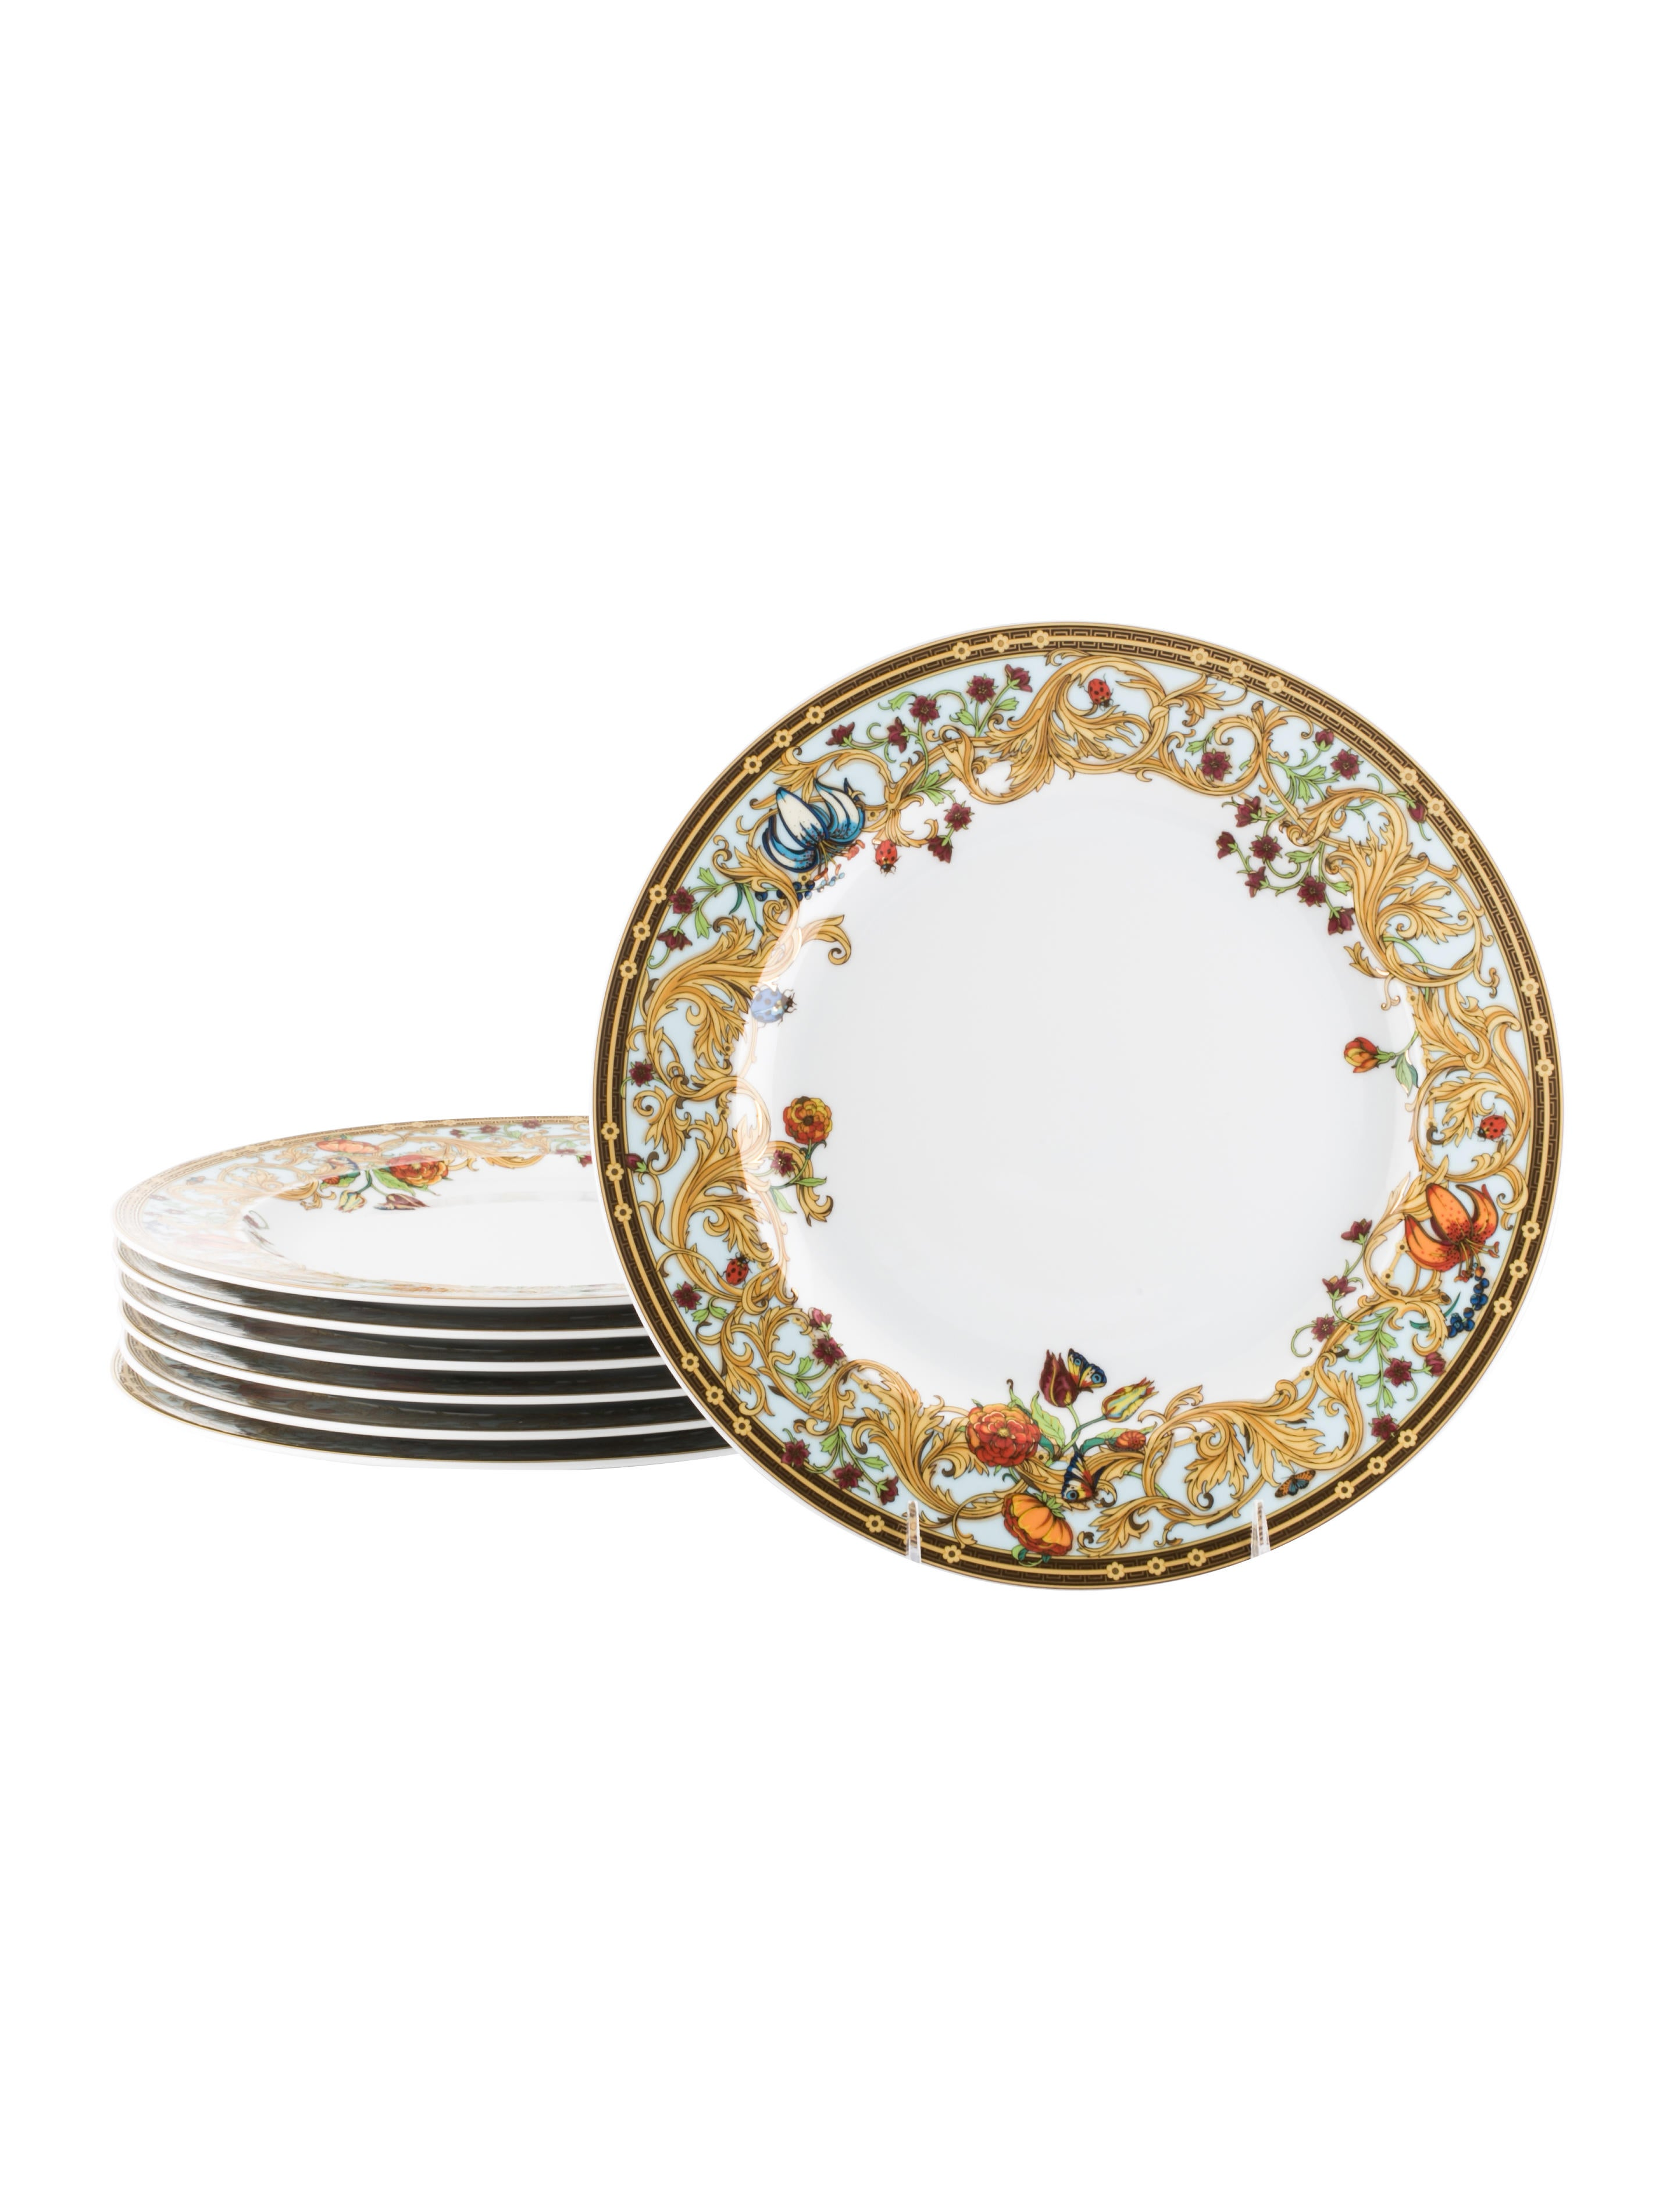 Set of 7 Le Jardin de Versace Dinner Plates  sc 1 st  The RealReal & Rosenthal Meets Versace Set of 7 Le Jardin de Versace Dinner Plates ...